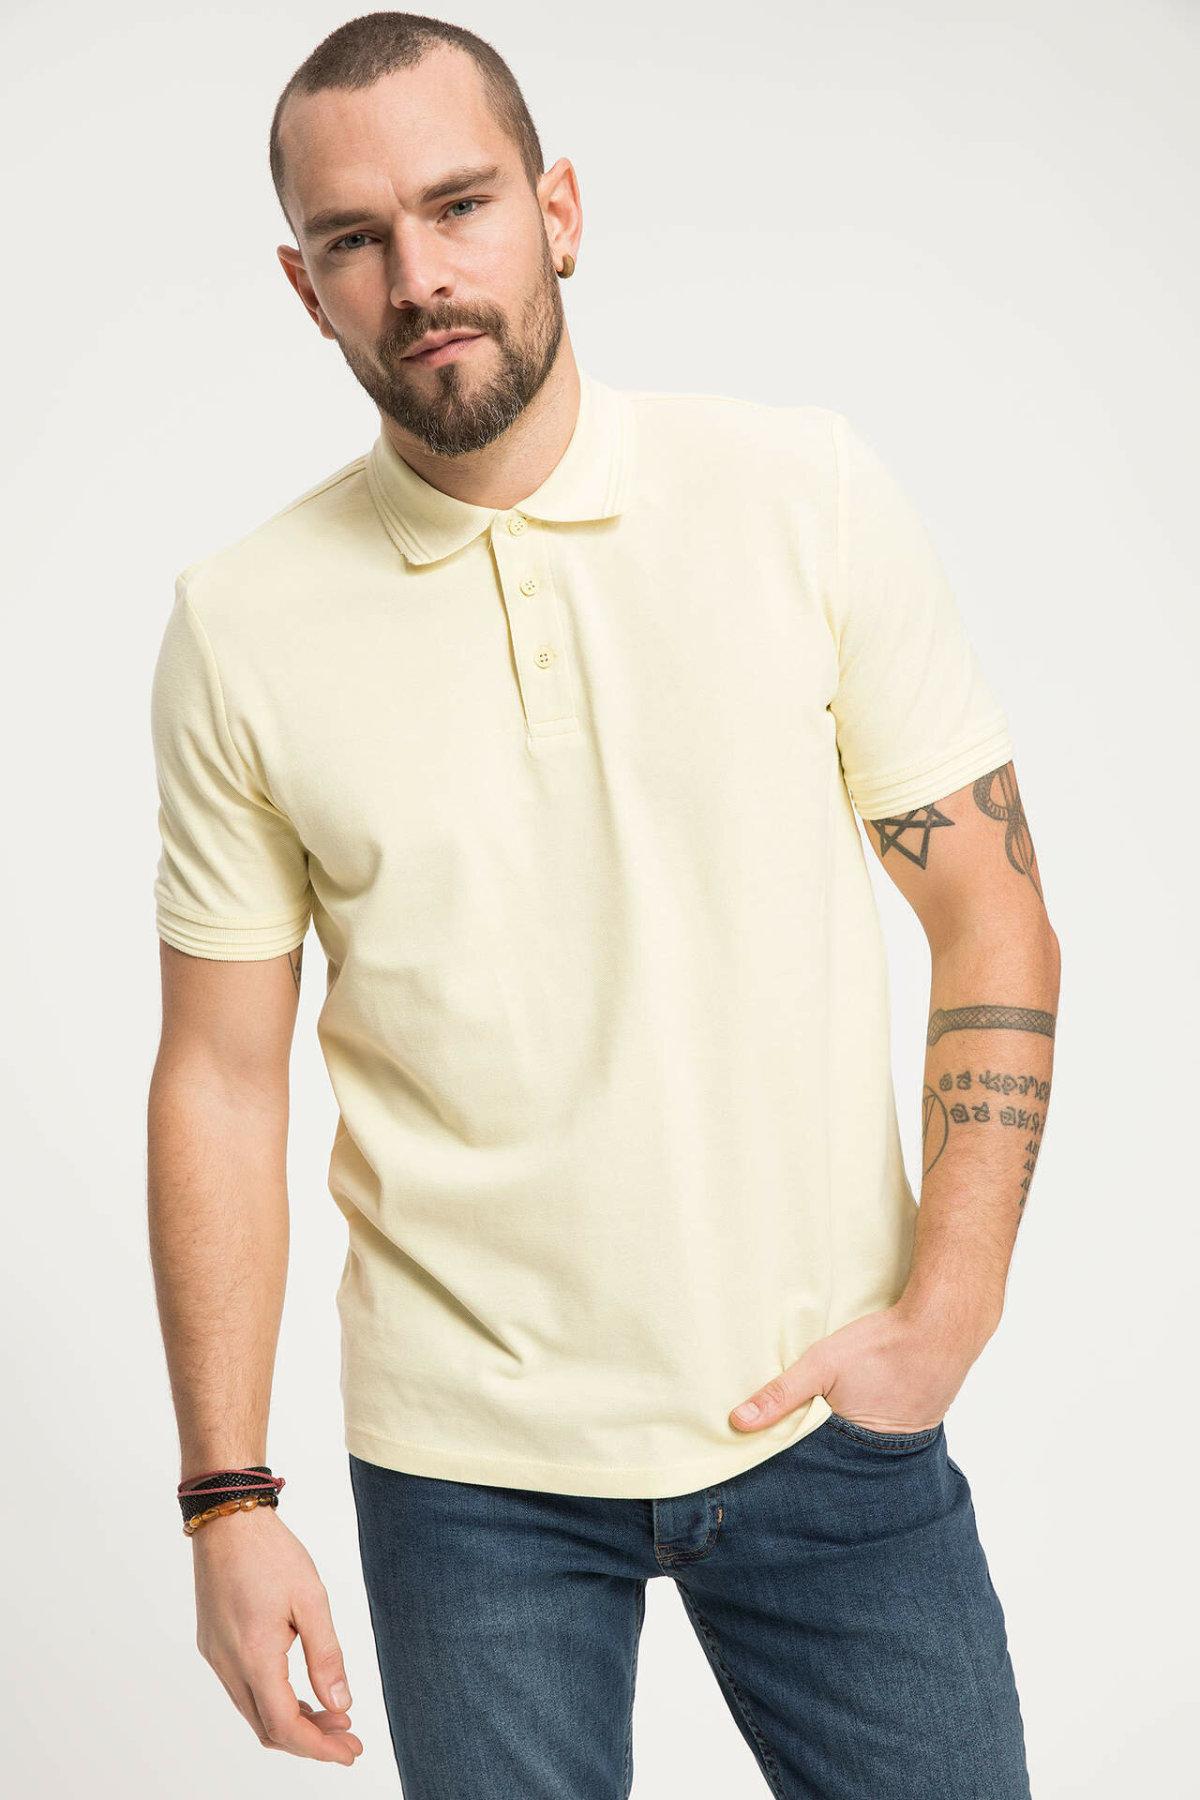 Polos blancos de manga corta para hombre defact, camisas lisas para hombre, Polos, cuello levantado, Camisa de algodón informal K0337AZ19SMWT34